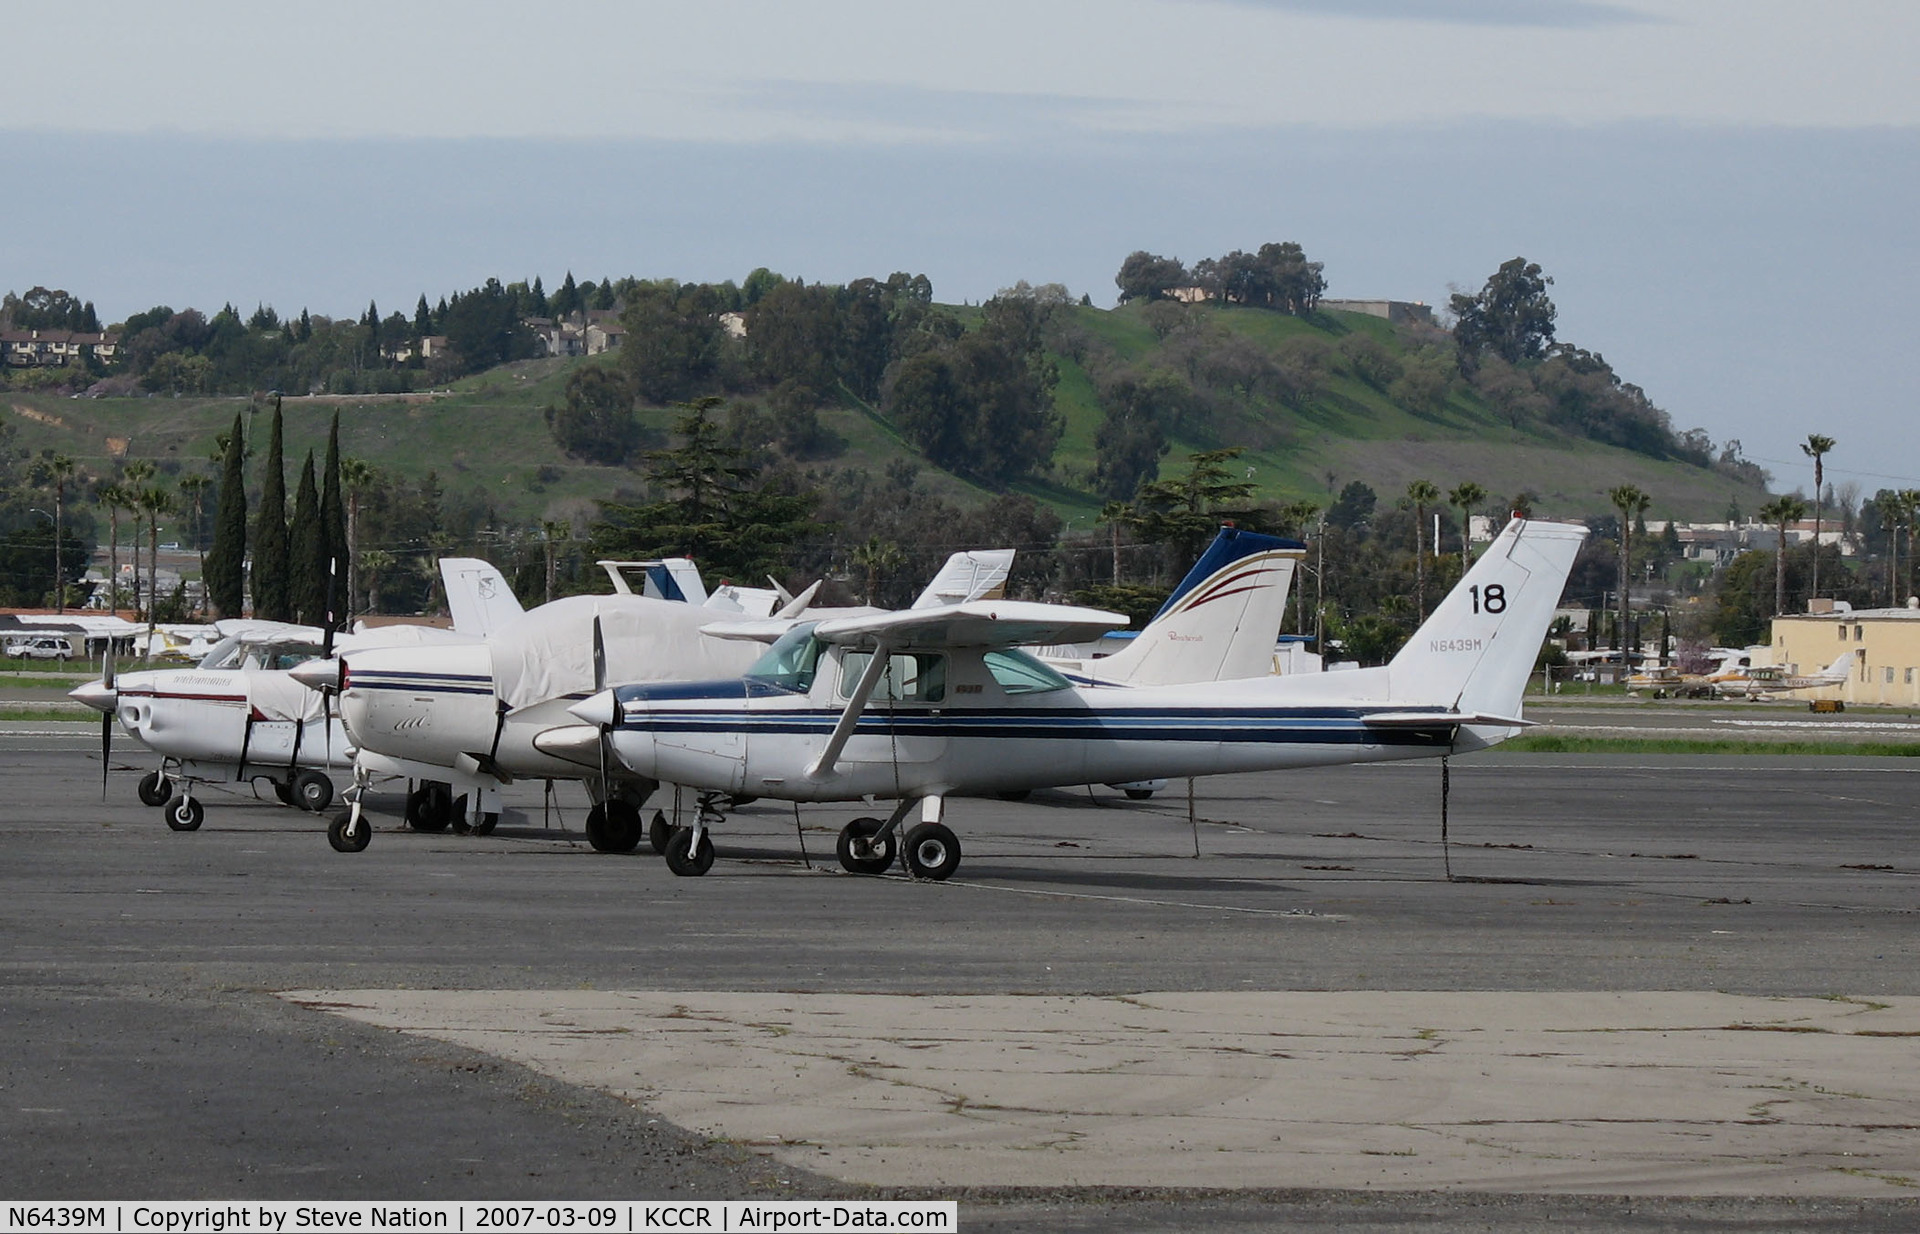 N6439M, 1980 Cessna 152 C/N 15284727, 1980 Cessna 152 #18 @ Buchanan Field (Concord, CA)